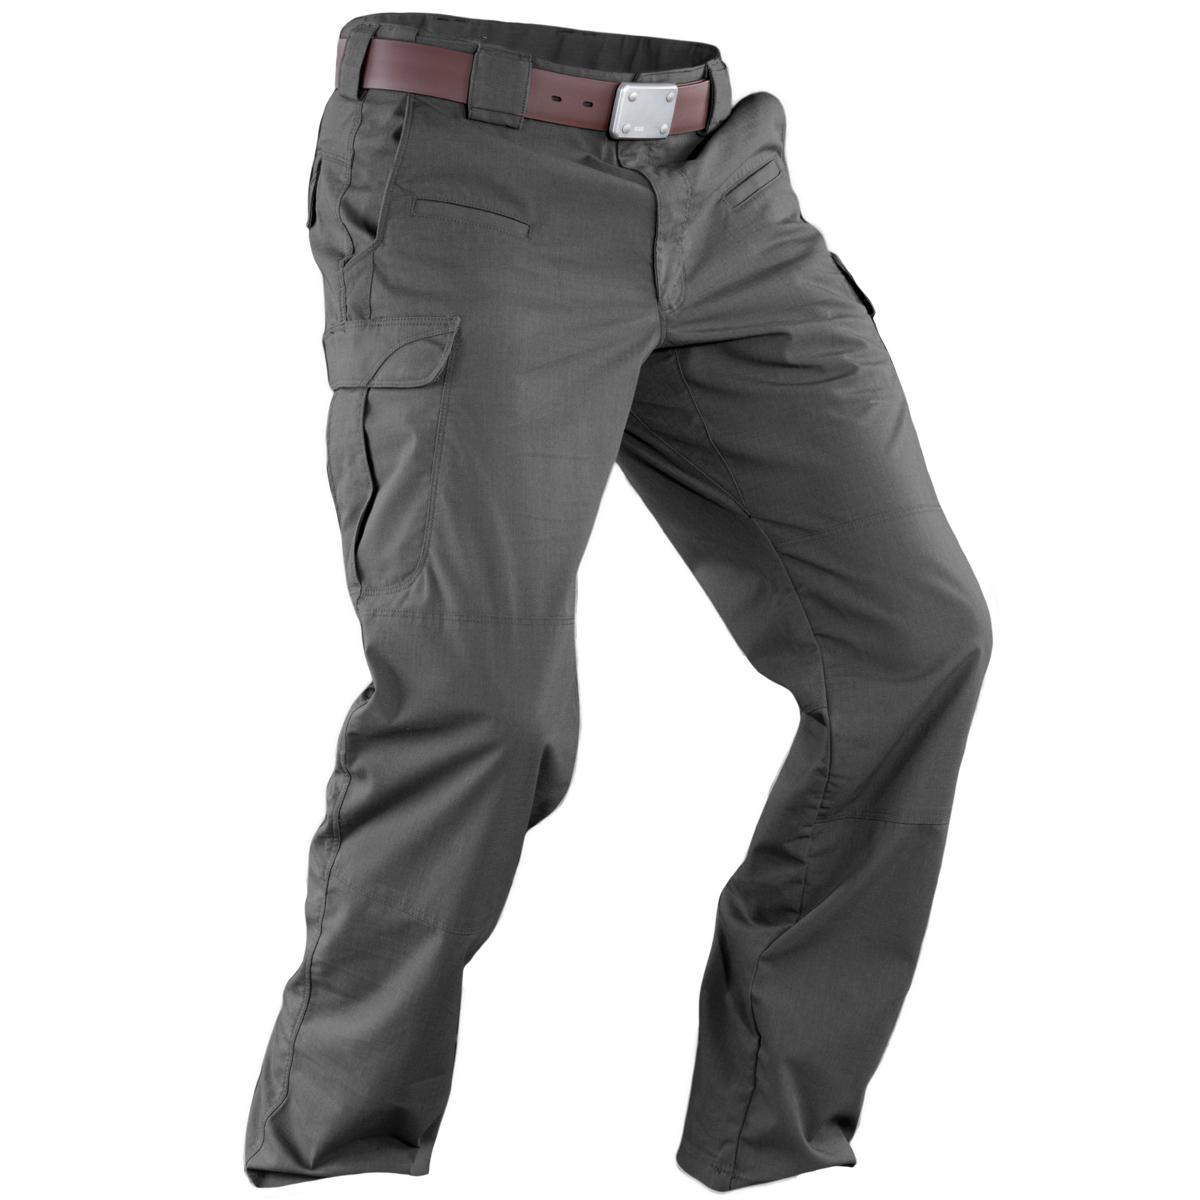 NEW! กางเกง Ranger (ทรง Stryke 5.11) สีเทา